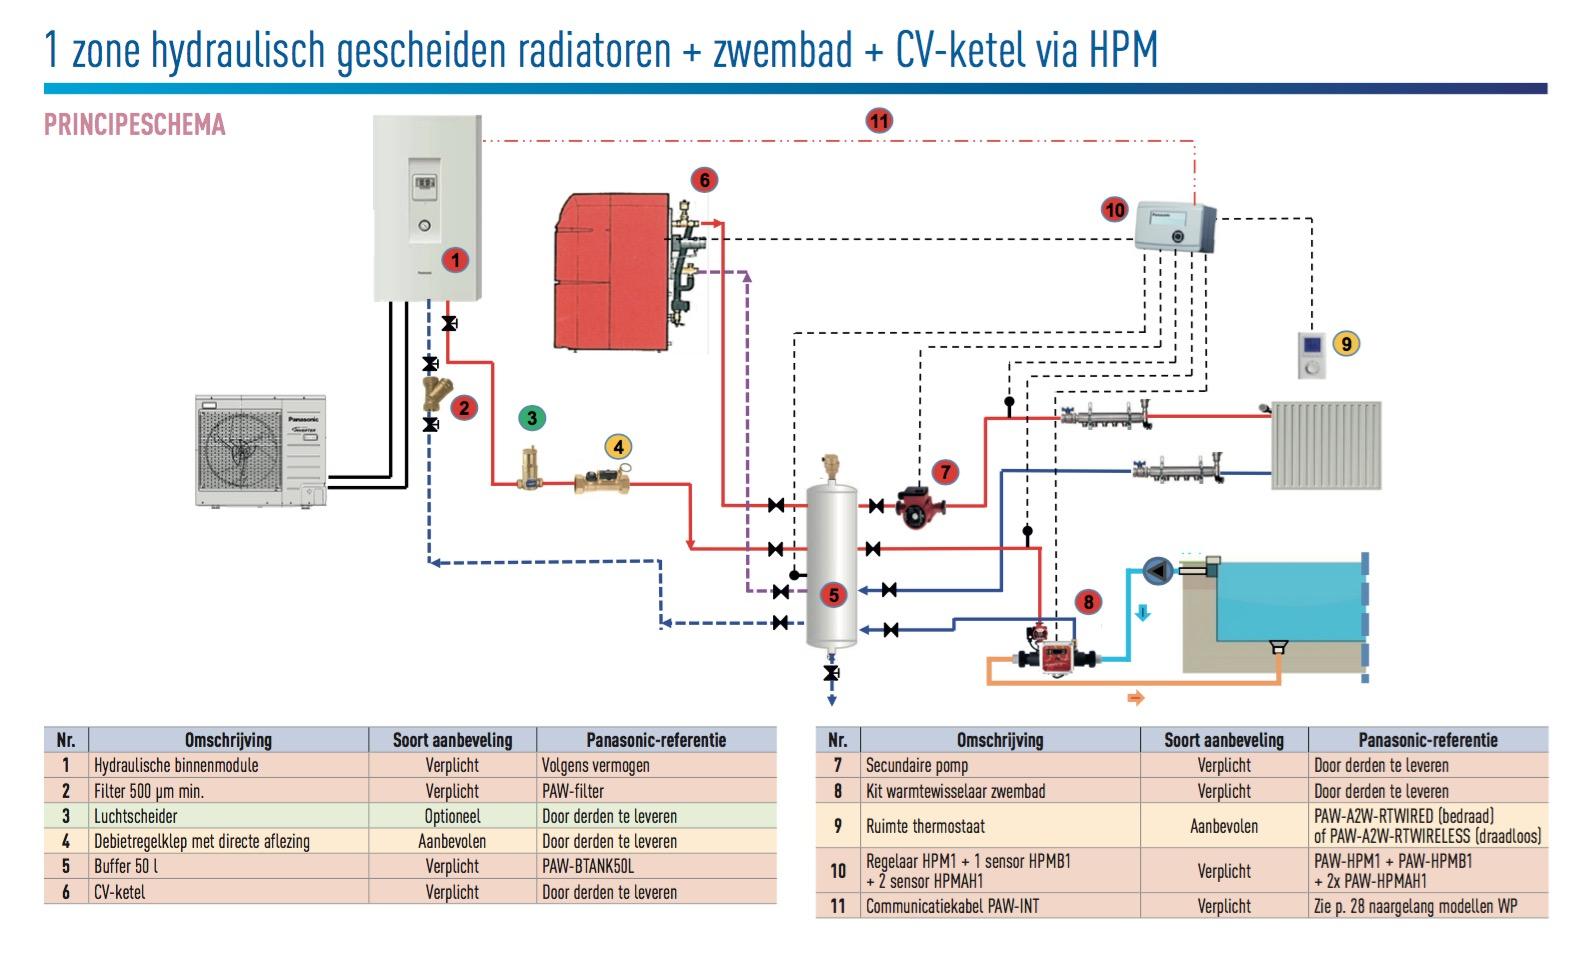 http://panasonicwarmtepompen.nl/wp-content/uploads/2018/10/1-zone-hydraulisch-gescheiden-radiatoren-zwembad-CV-ketel-via-HPM.jpg